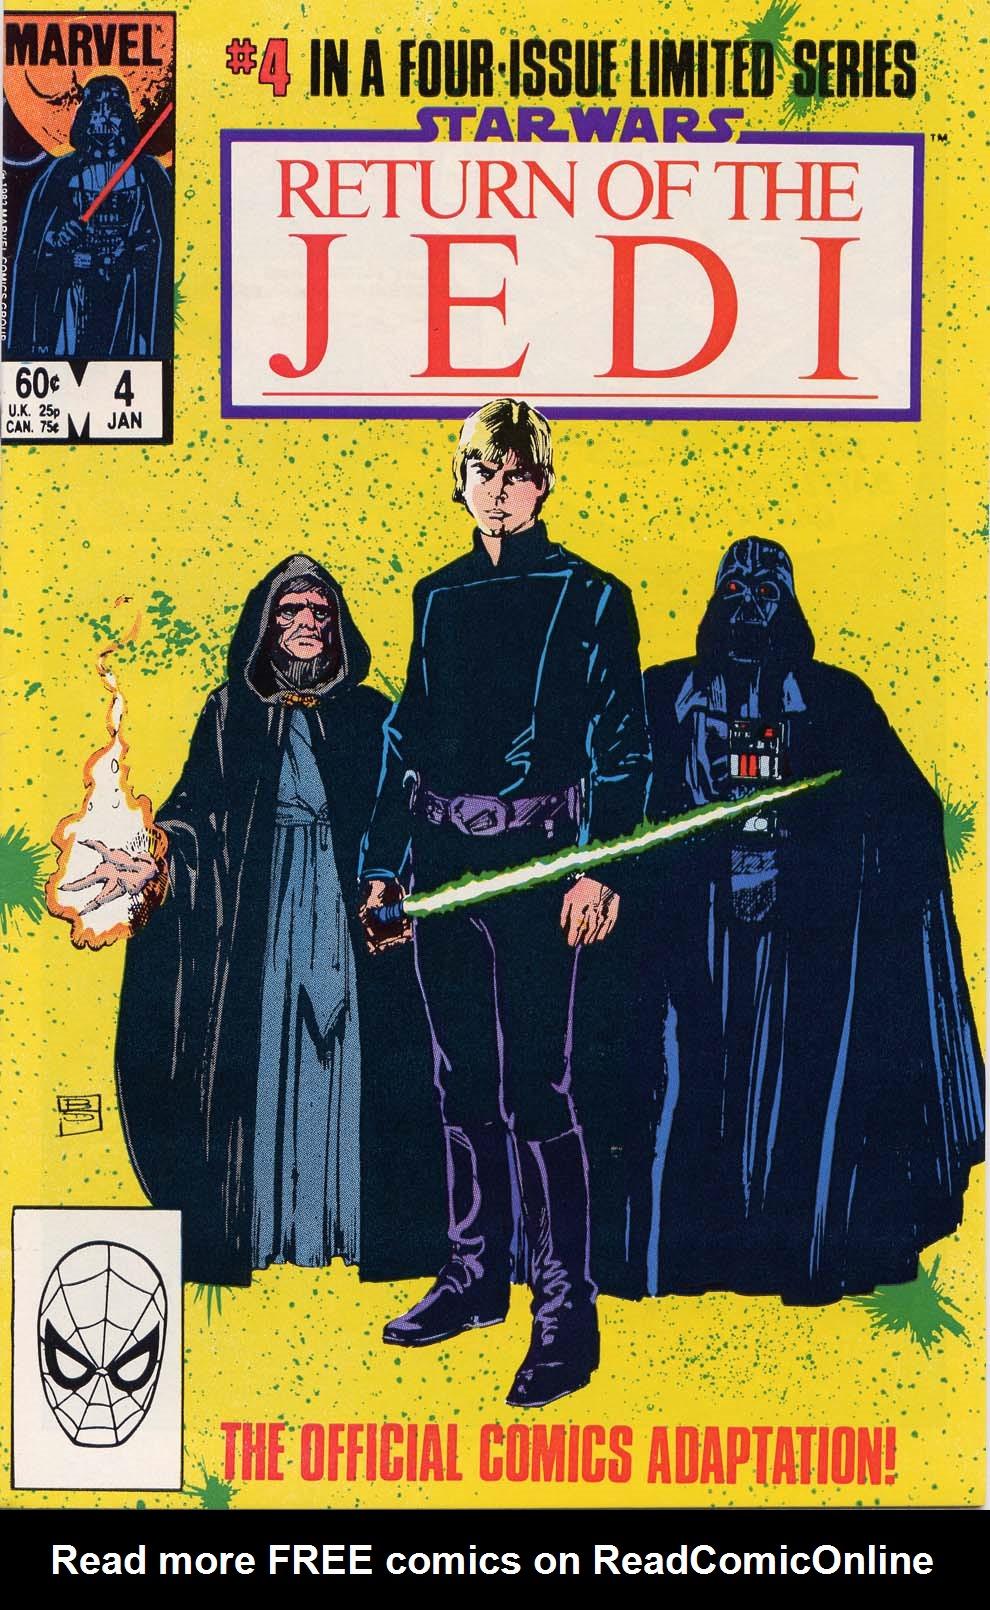 Star Wars: Return of the Jedi 4 Page 1